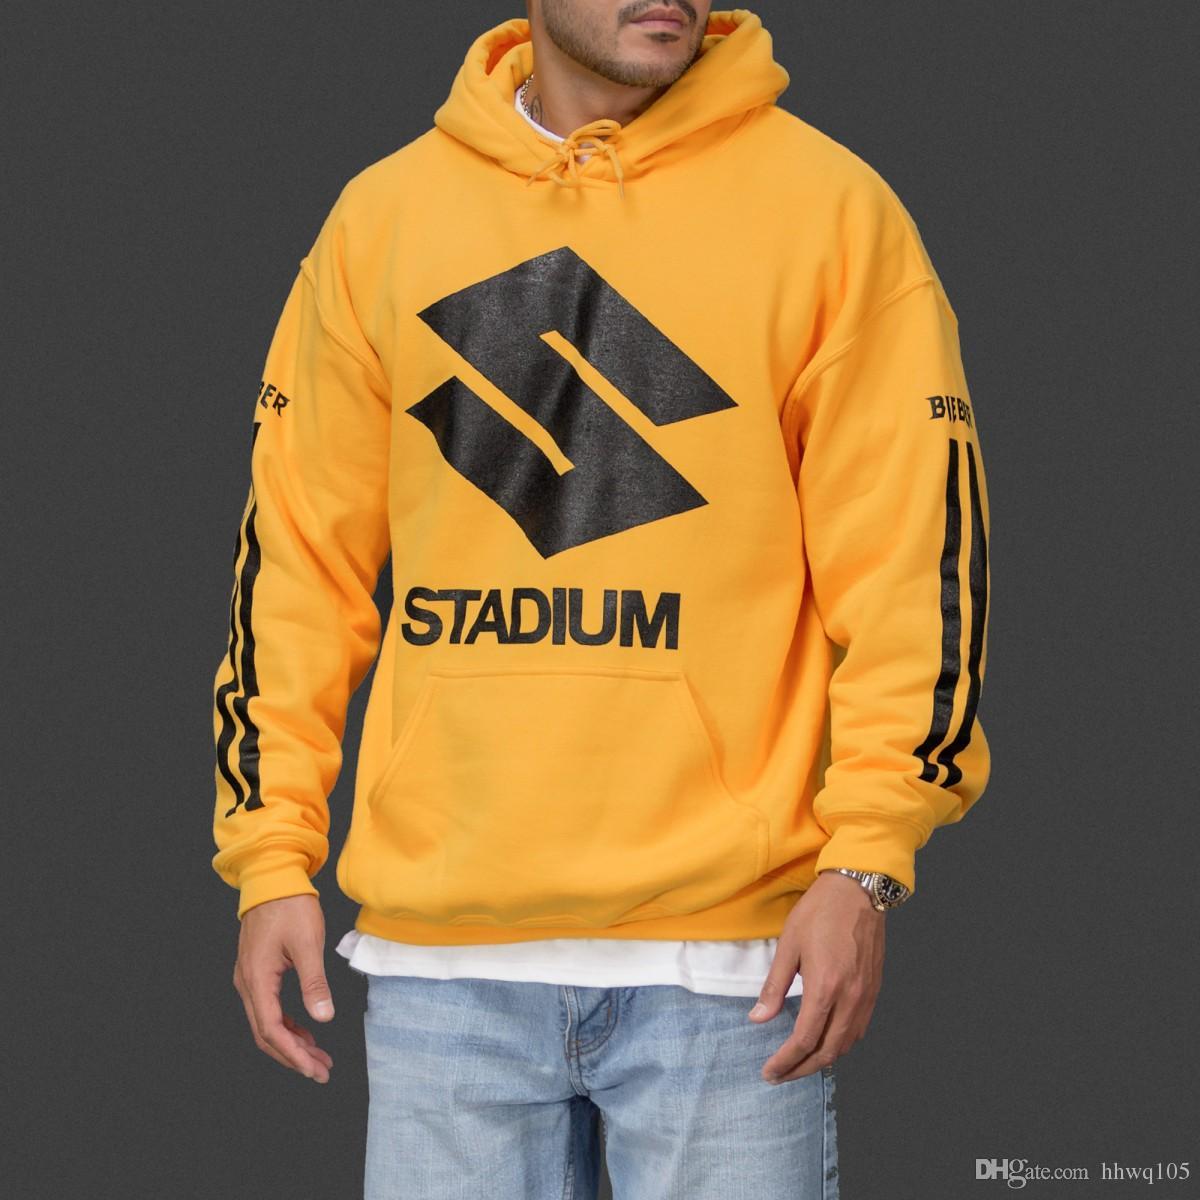 6ea0deb36184 2019 Justin Bieber Purpose Tour Stadium Hoodie Men Women Yellow Pullover  Fleece Hoodie Fashion Winter Skateboards Sport Sweatshirt YYG1015 From  Hhwq105